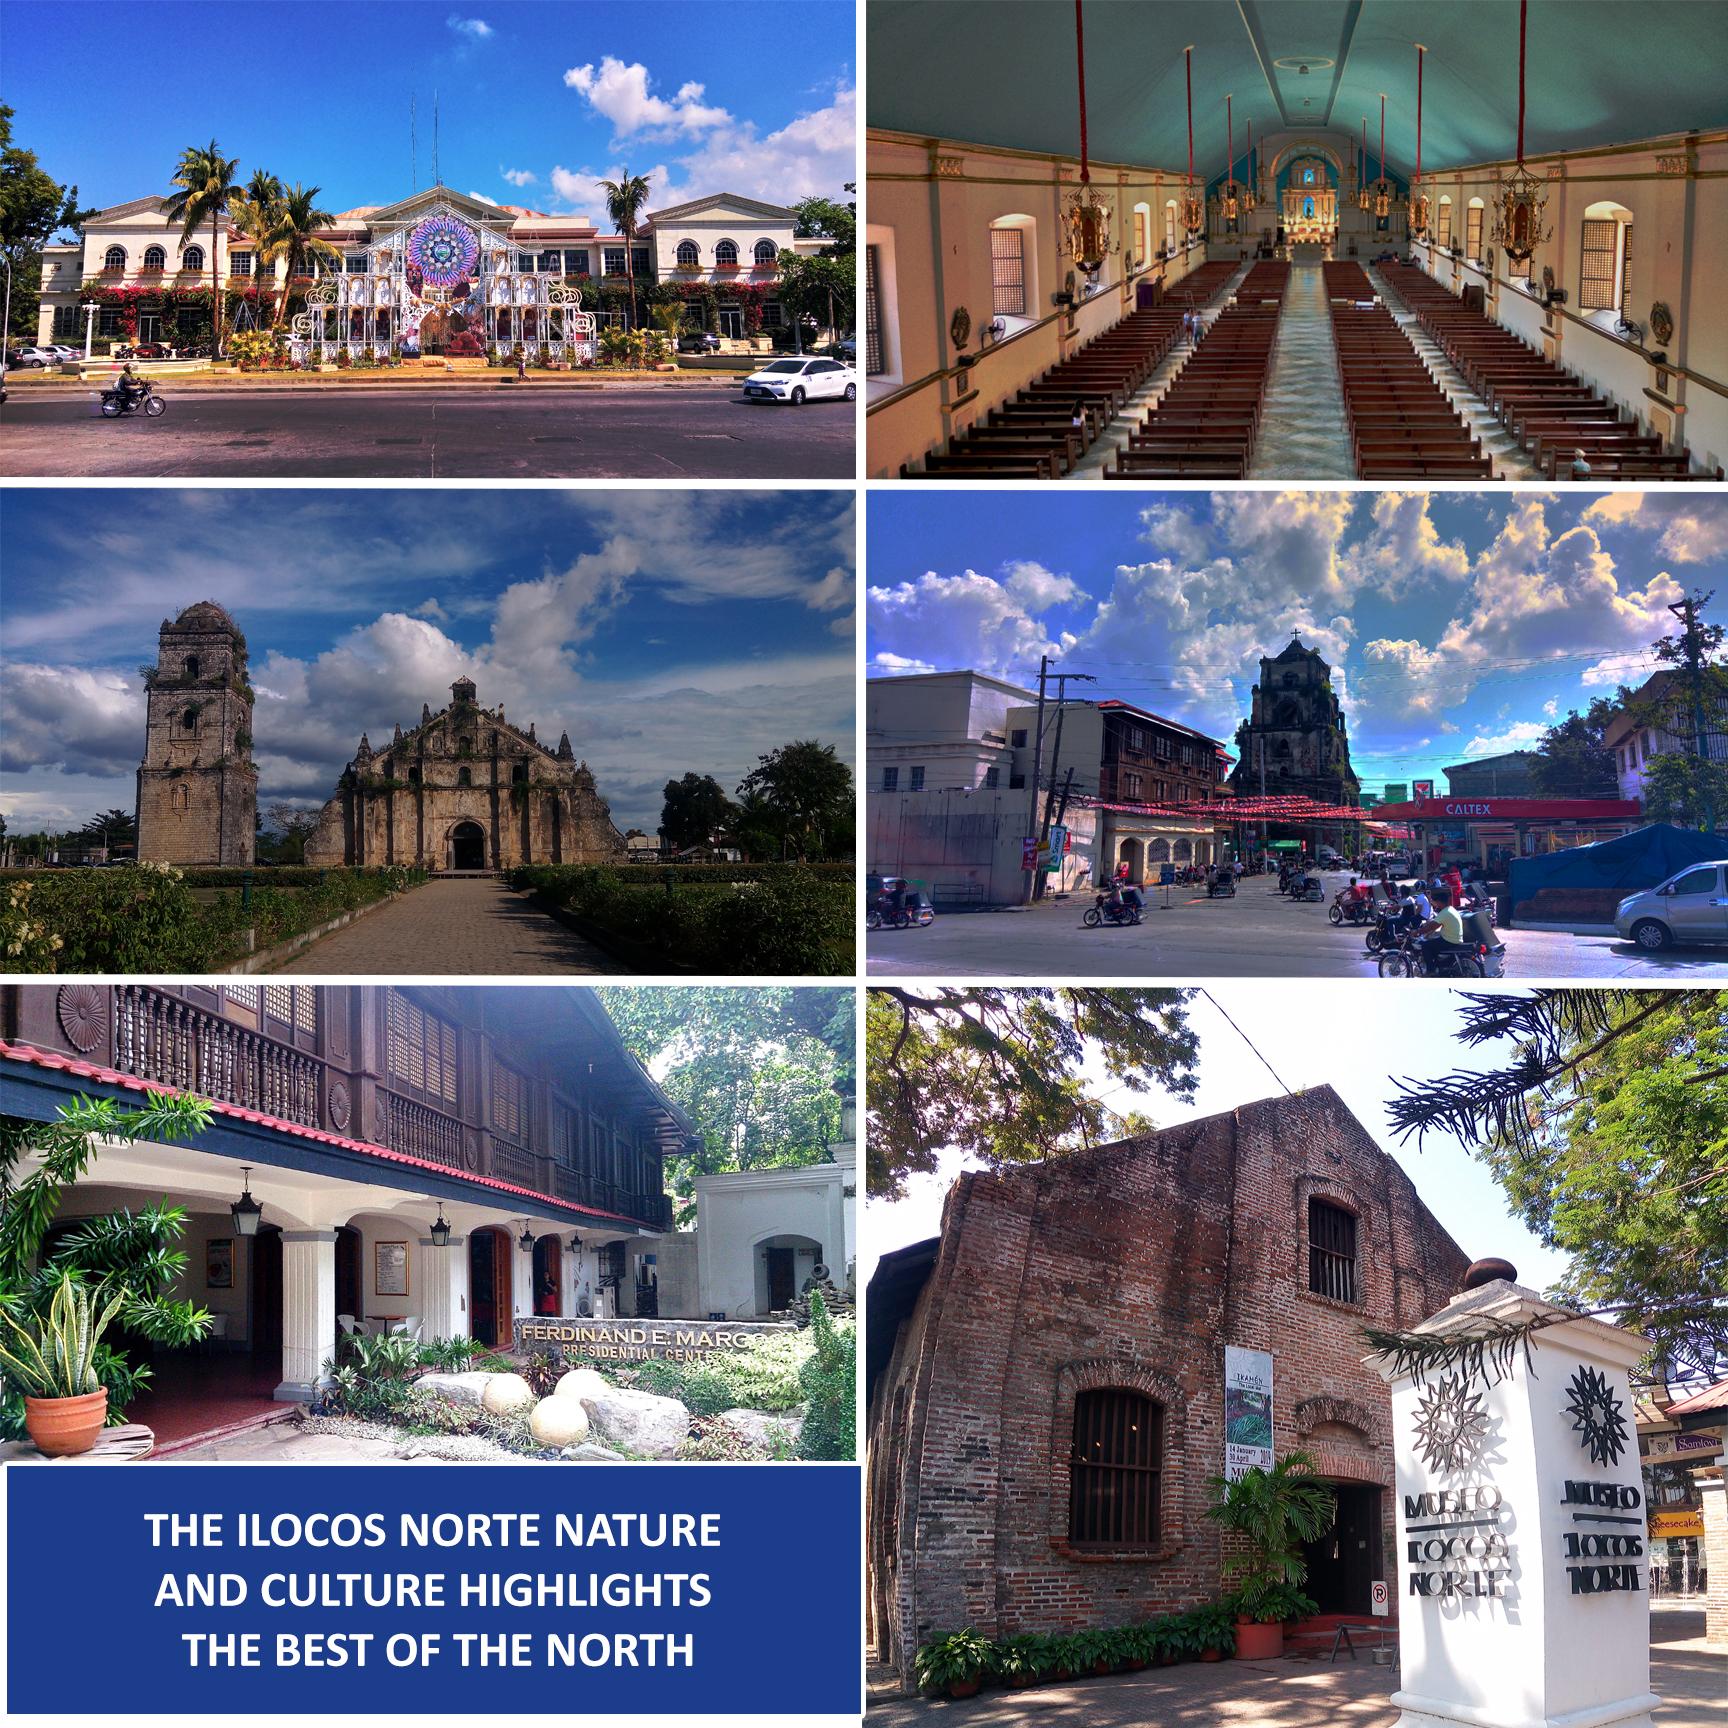 Pagudpud & Laoag Ilocos Sightseeing | With Hotel Pickup & Dropoff - day 1